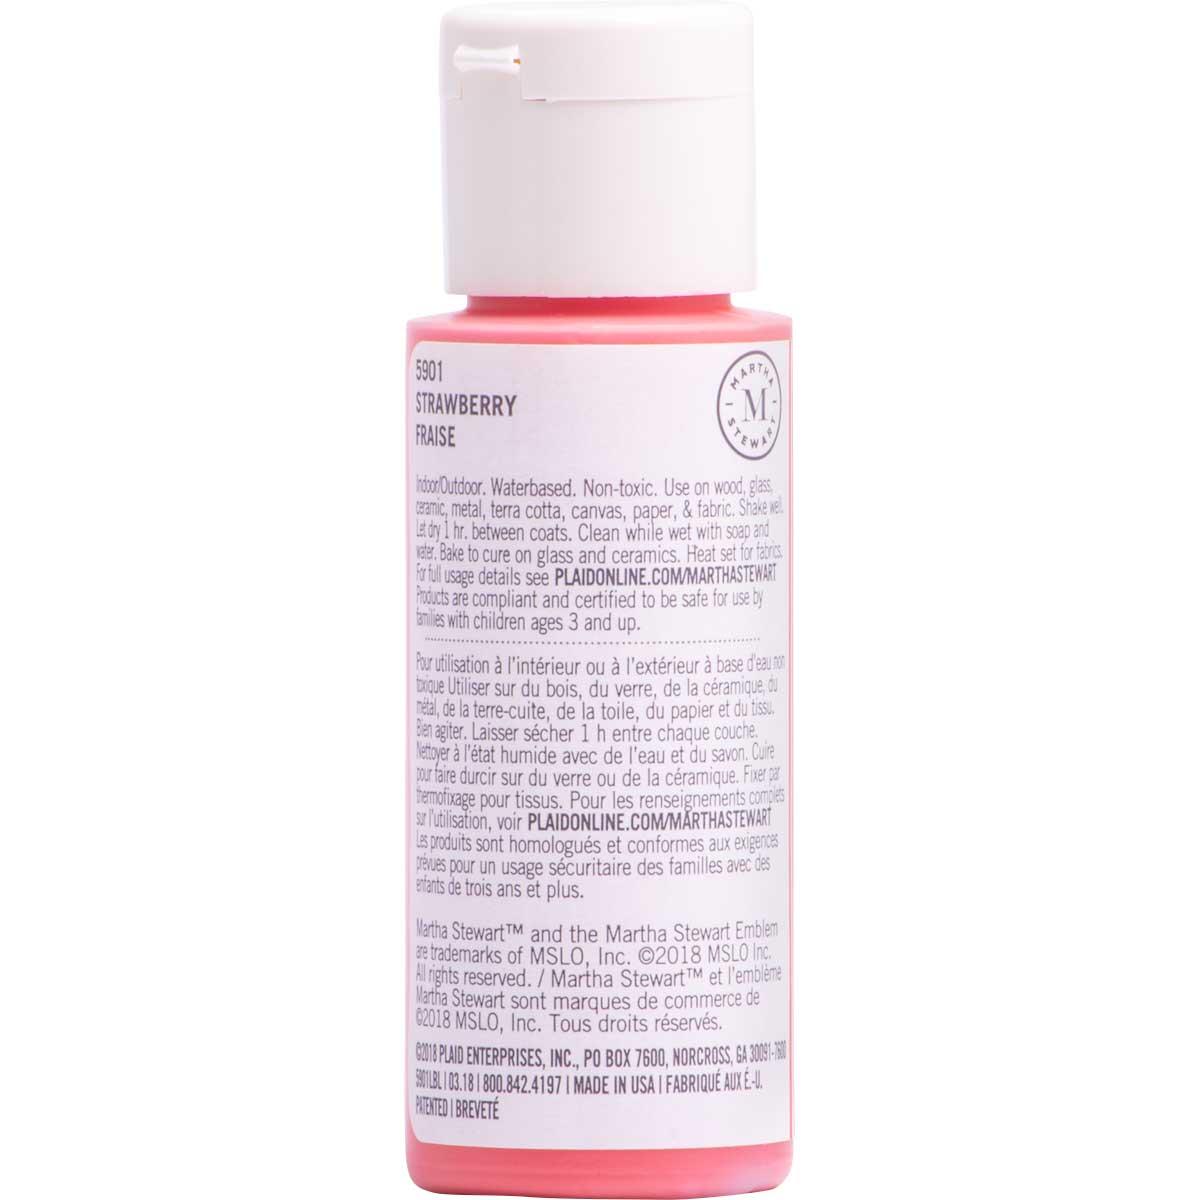 Martha Stewart ® Multi-Surface Satin Acrylic Craft Paint CPSIA - Strawberry, 2 oz.